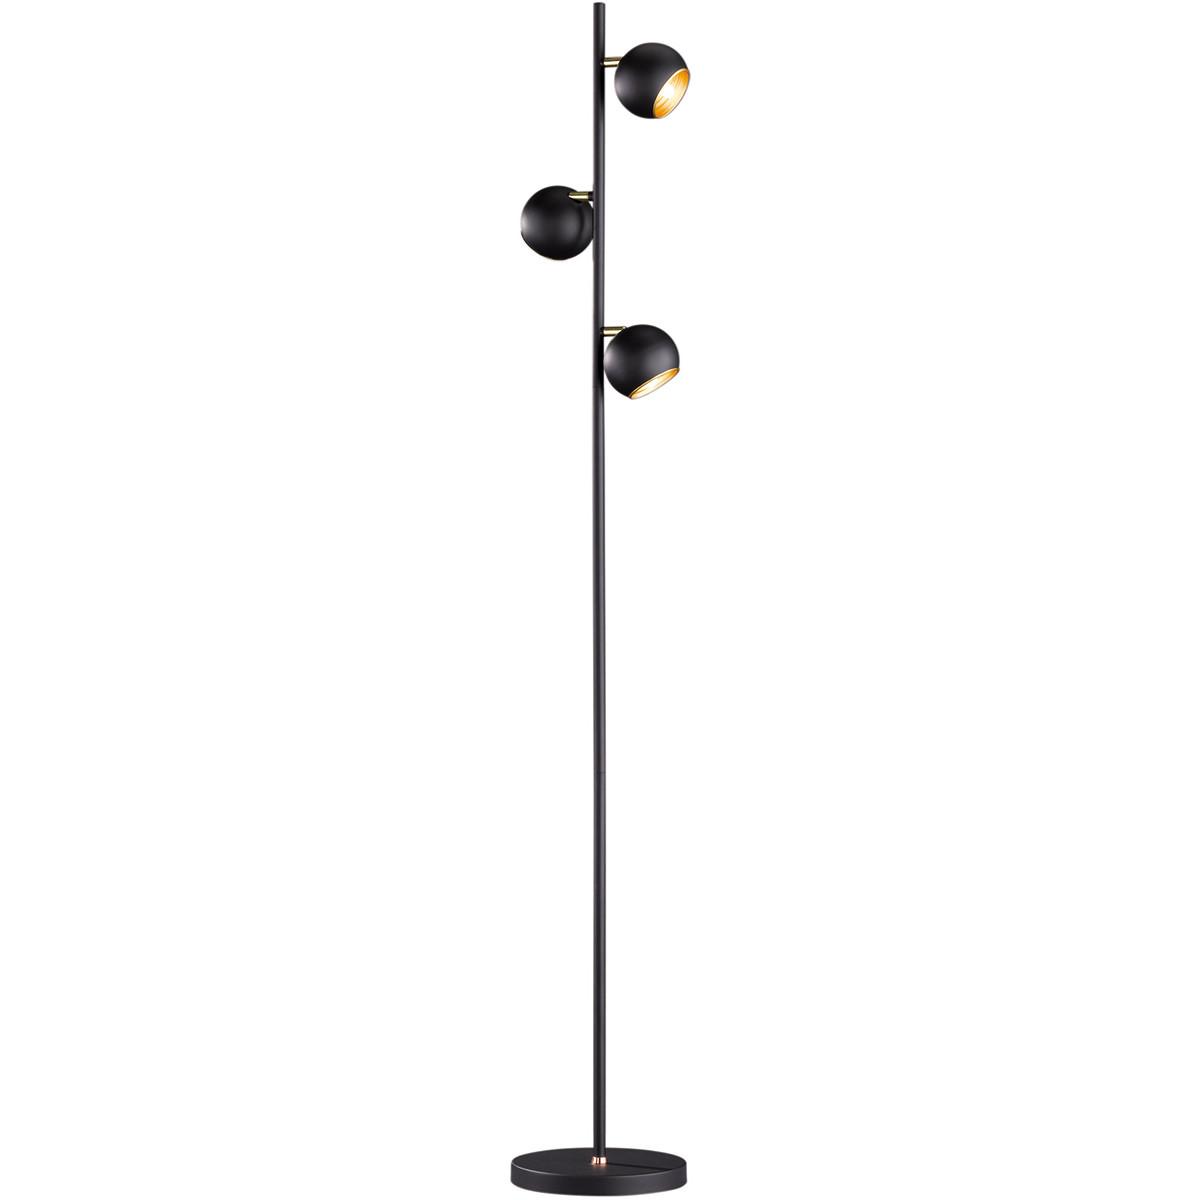 LED Vloerlamp - Trion Dakani - G9 Fitting - 3-lichts - Rond - Mat Zwart - Aluminium